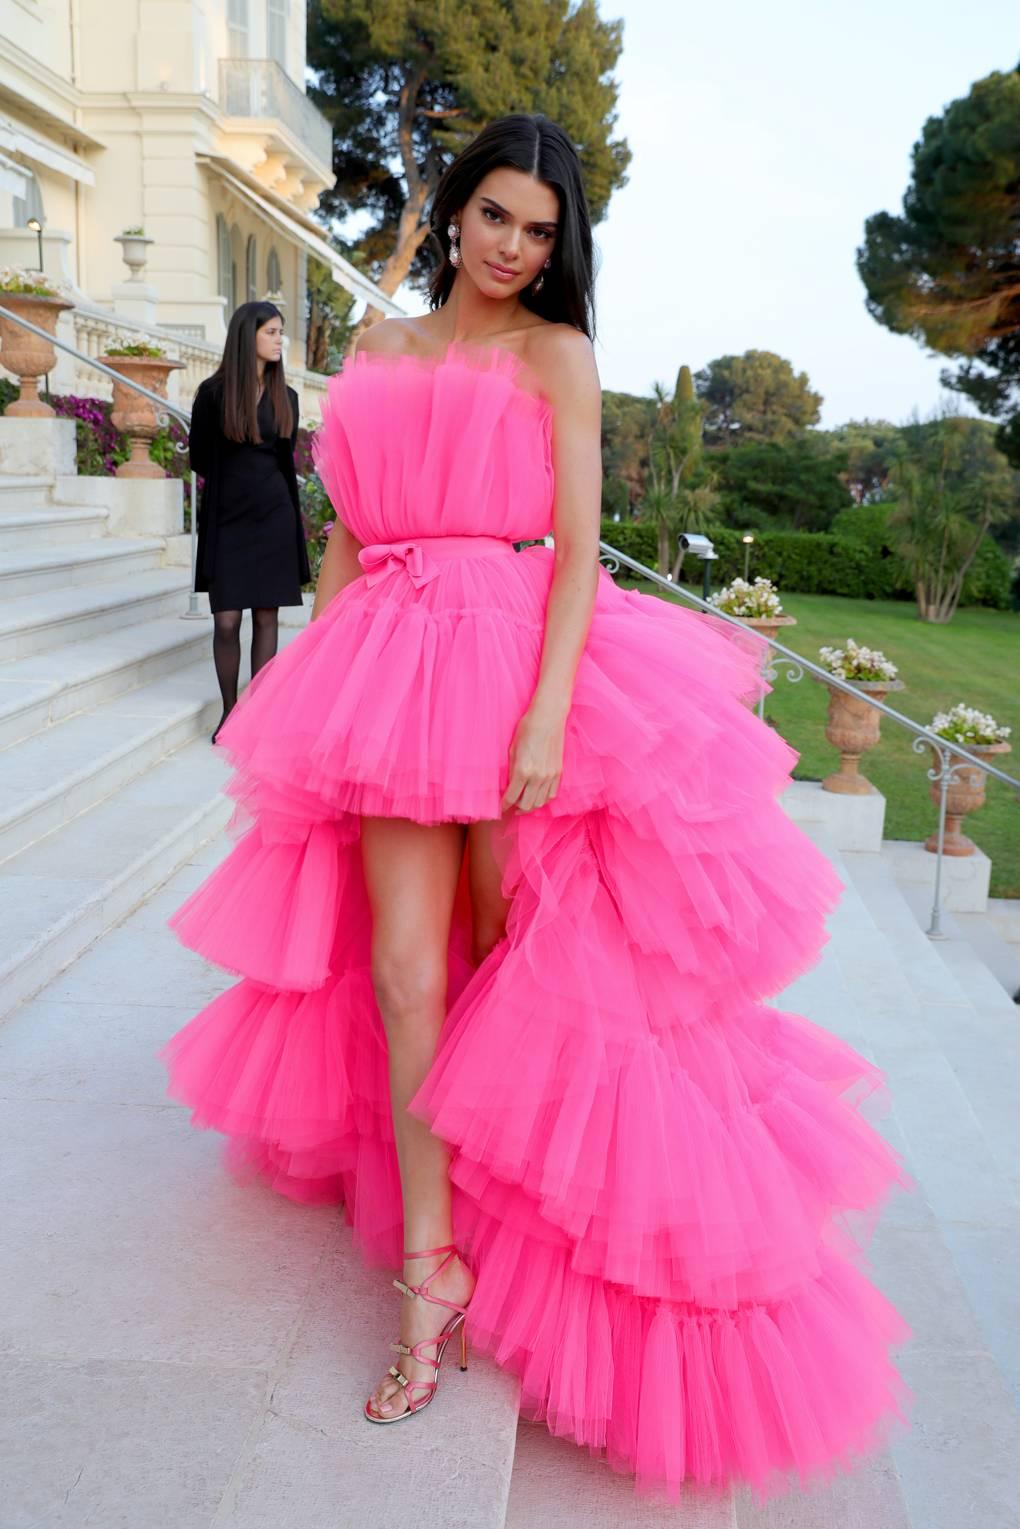 Cannes - Kendall Jenner in Giambattista Valli x H&M.jpg